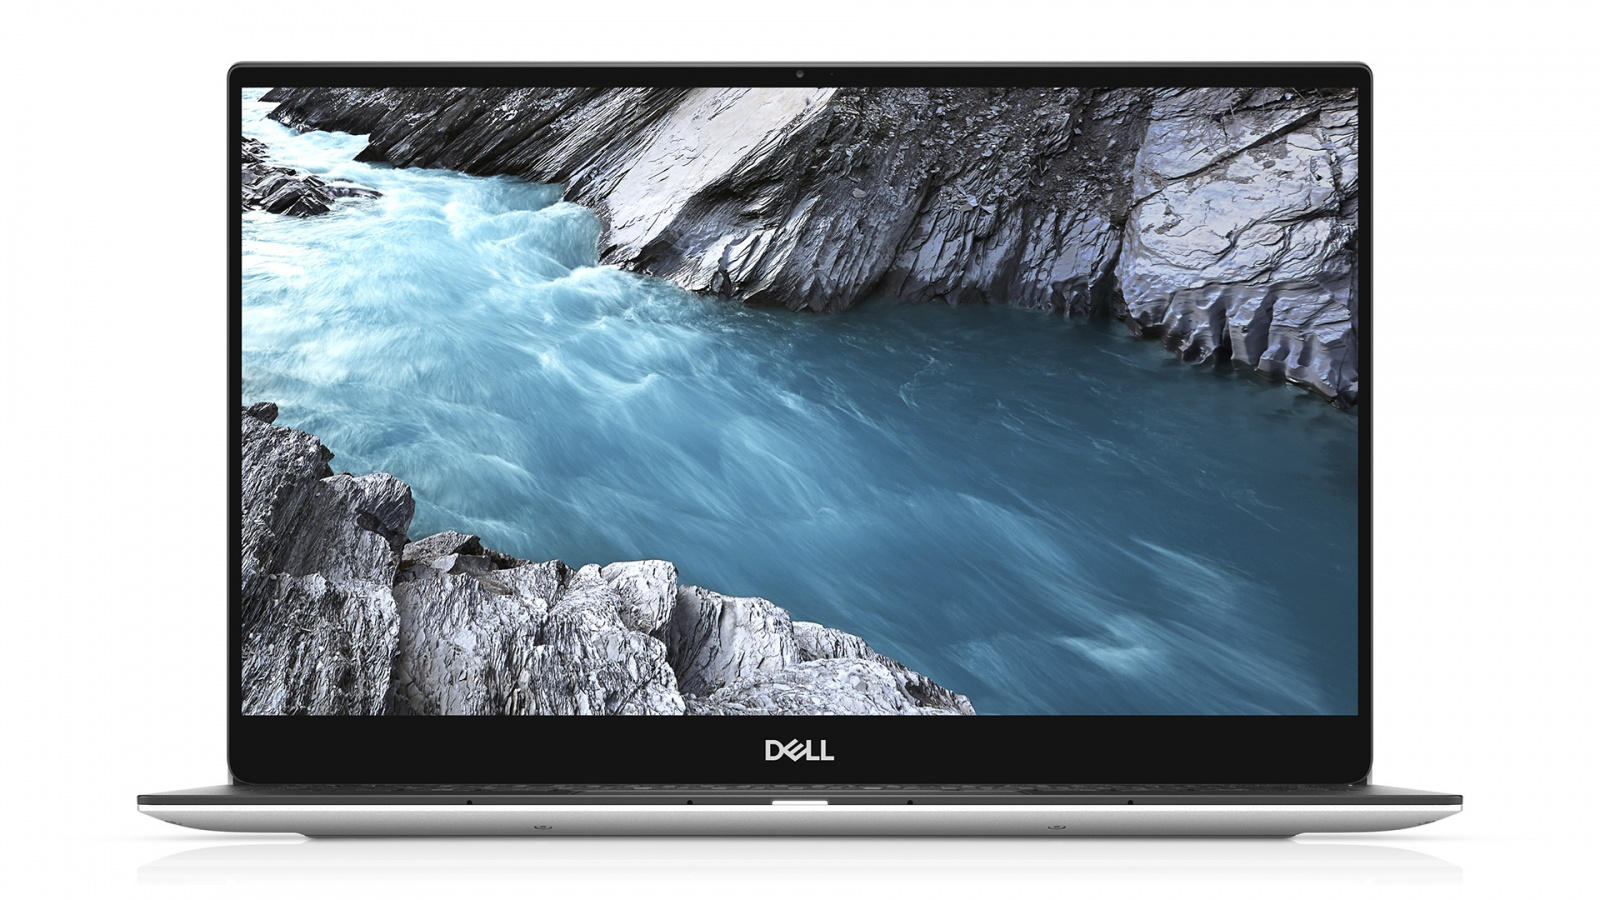 Dell и Alienware на CES 2019: гайд по всем основным новинкам - 3